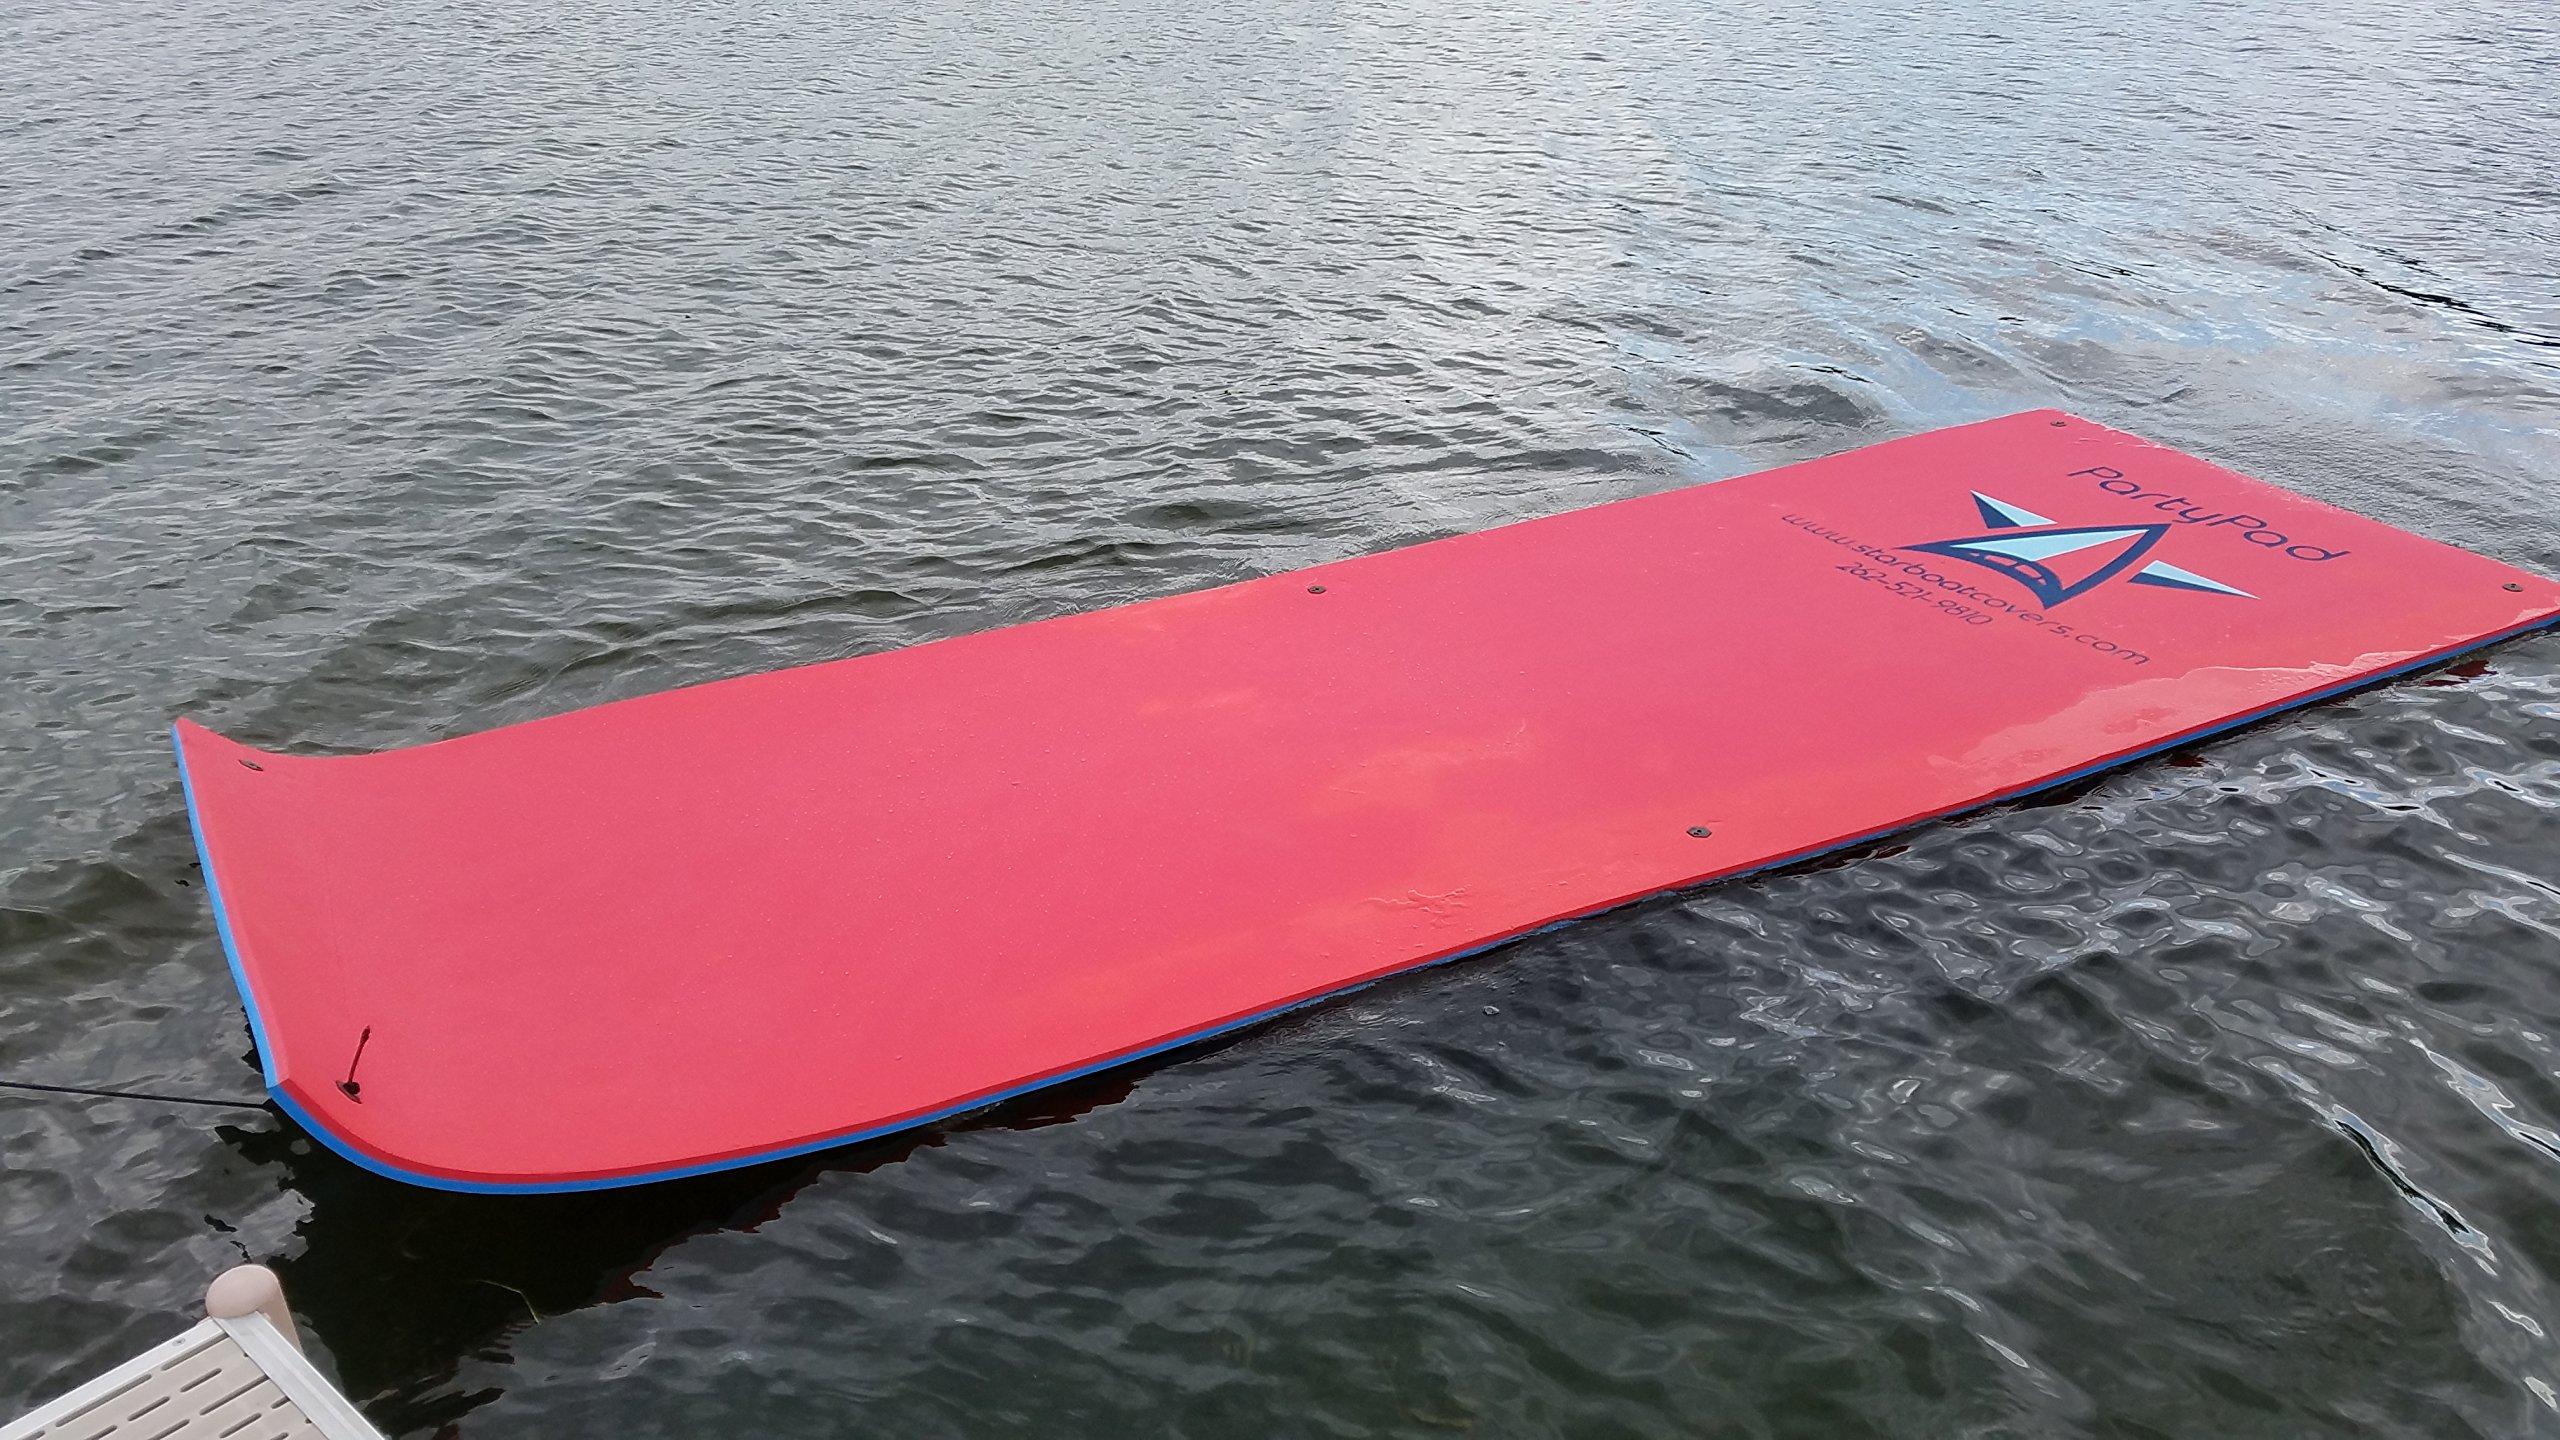 Vico Marine Floating Foam Pad - Red/Blue by Vico Marine (Image #2)